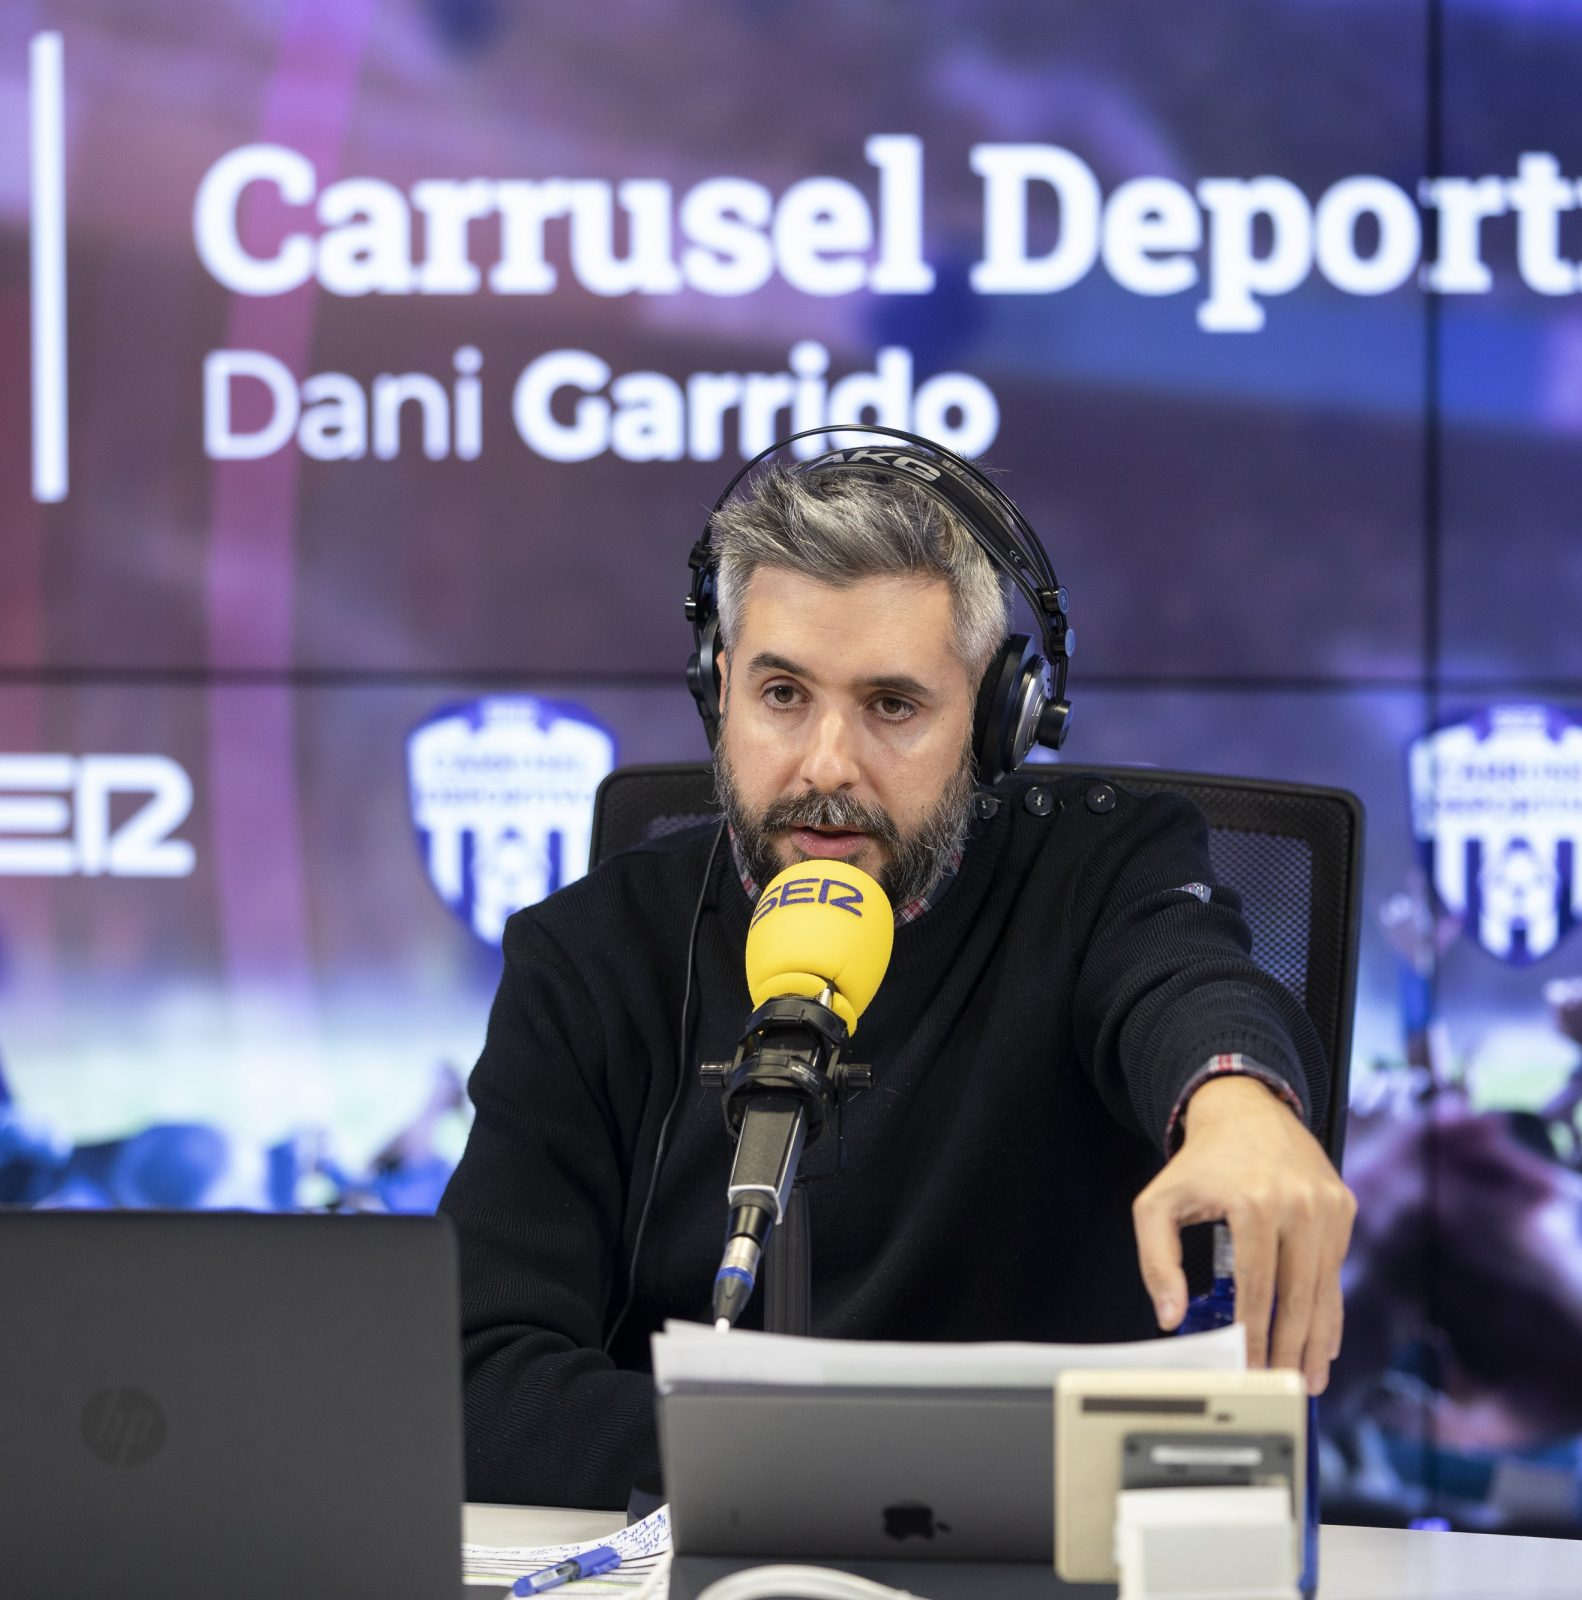 Dani Garrido